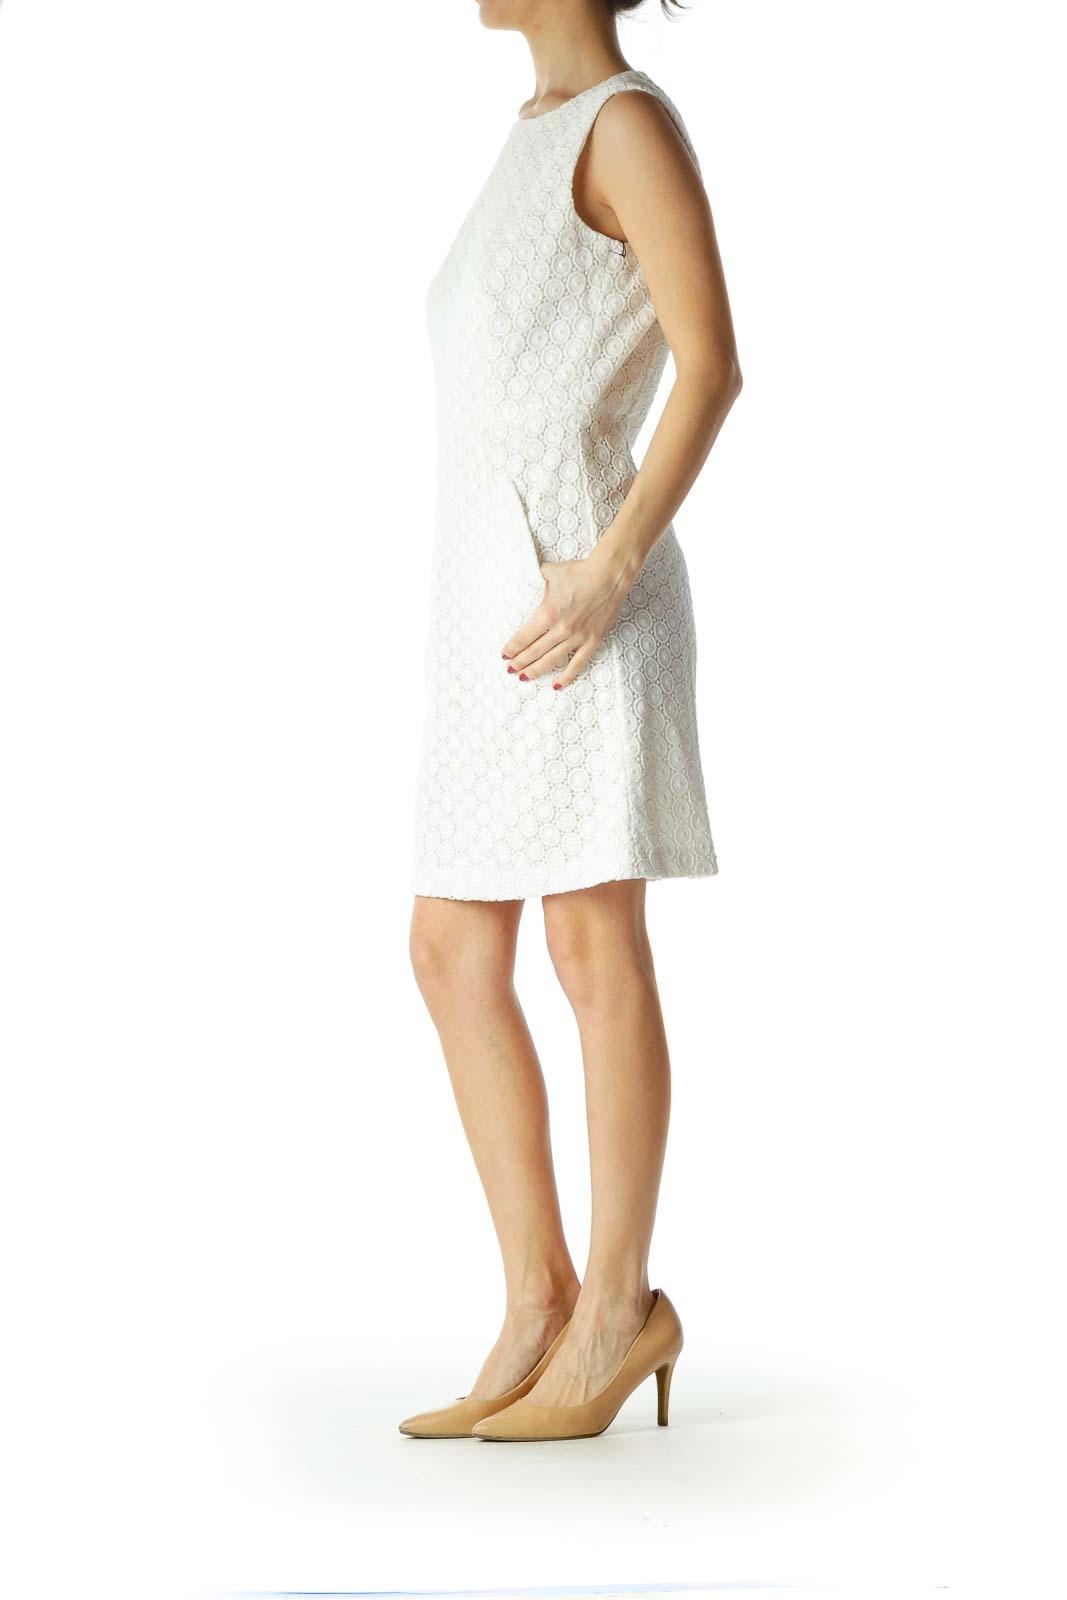 White Slightly Metallic Knit Dress with Pockets